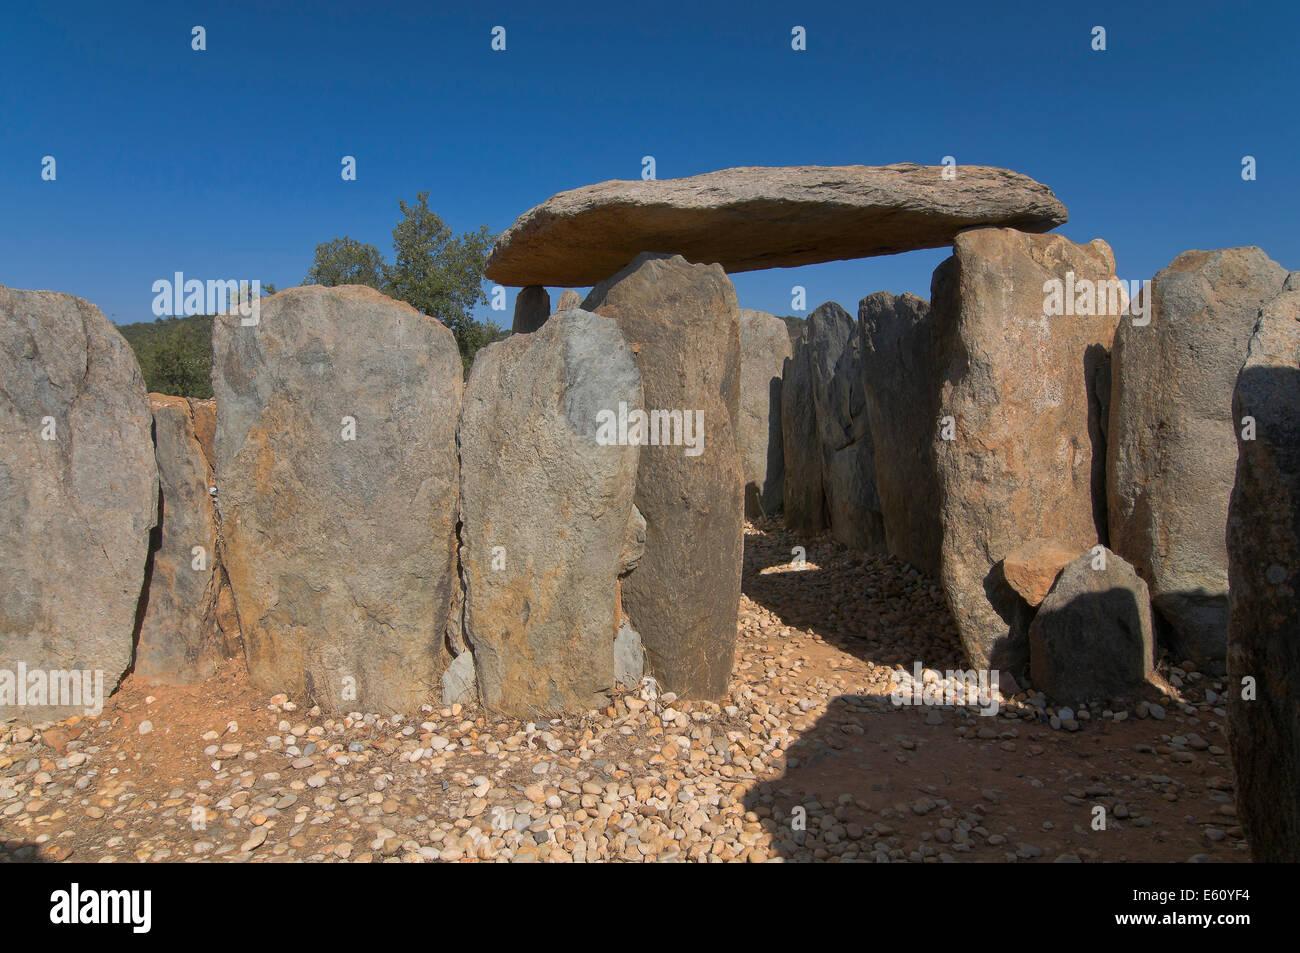 Dolmens of El Pozuelo - betwen 2500-2200 BC, Zalamea La Real. Huelva province, Region of Andalusia, Spain, Europe Stock Photo